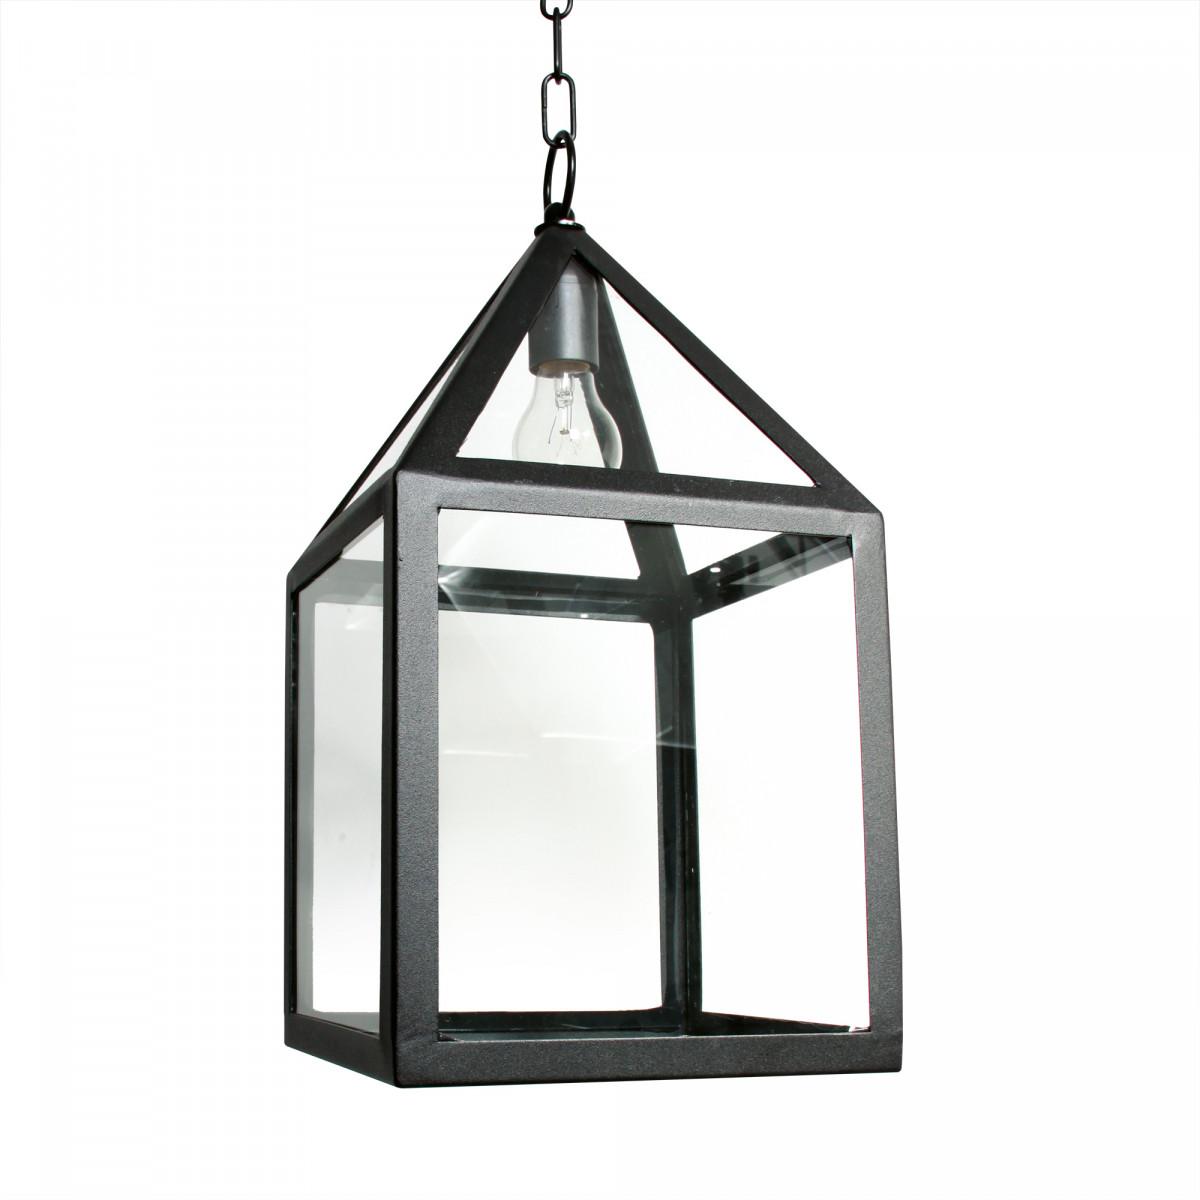 Hänglampe - Veranda Lampe Leusden